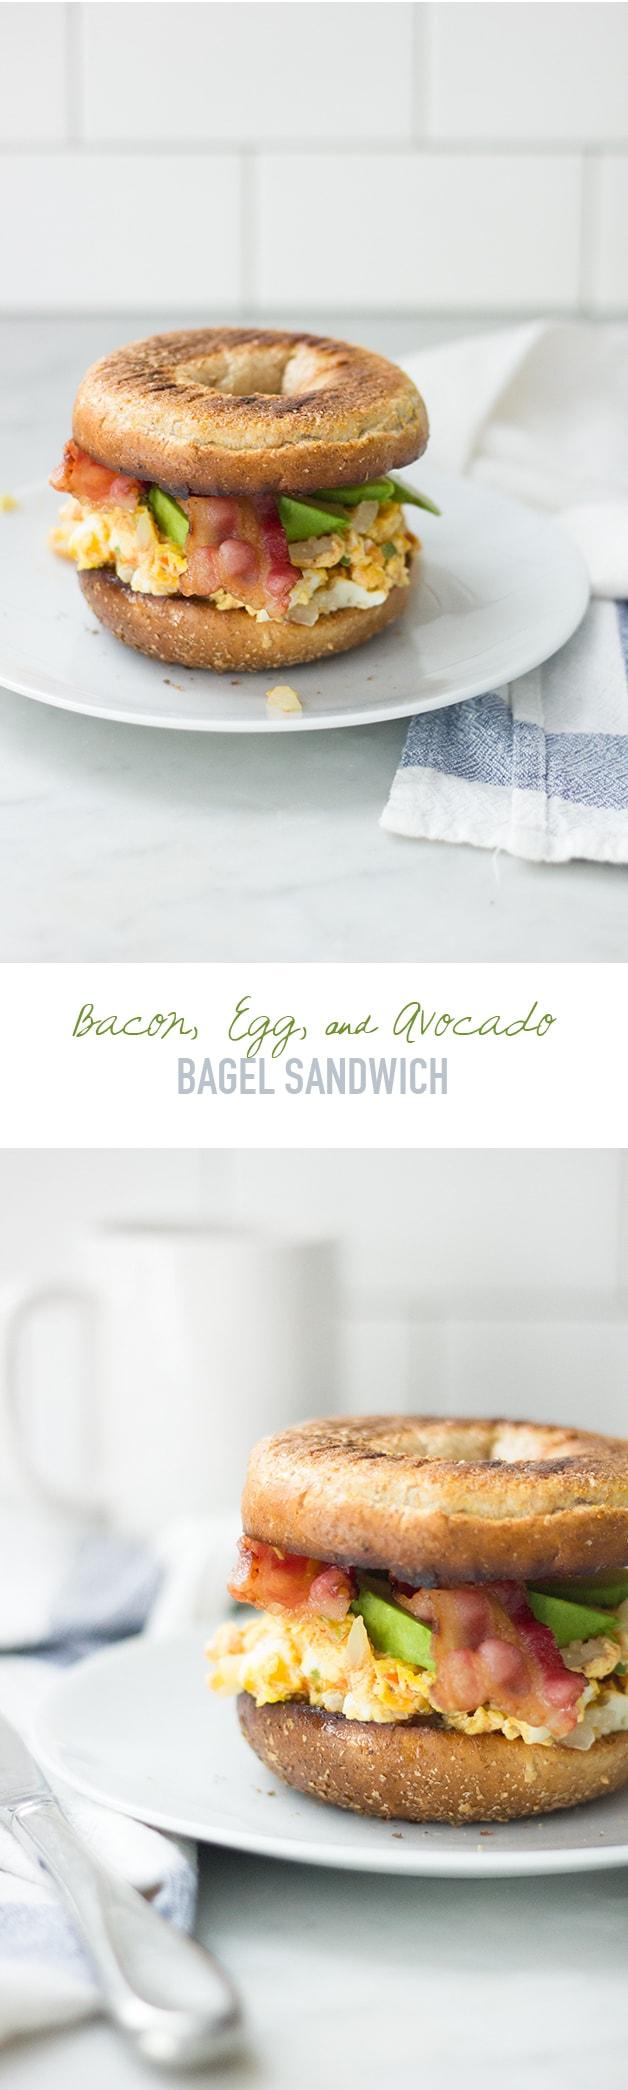 Bacon, Egg, & Avocado Bagel Sandwich | www.brighteyedbaker.com